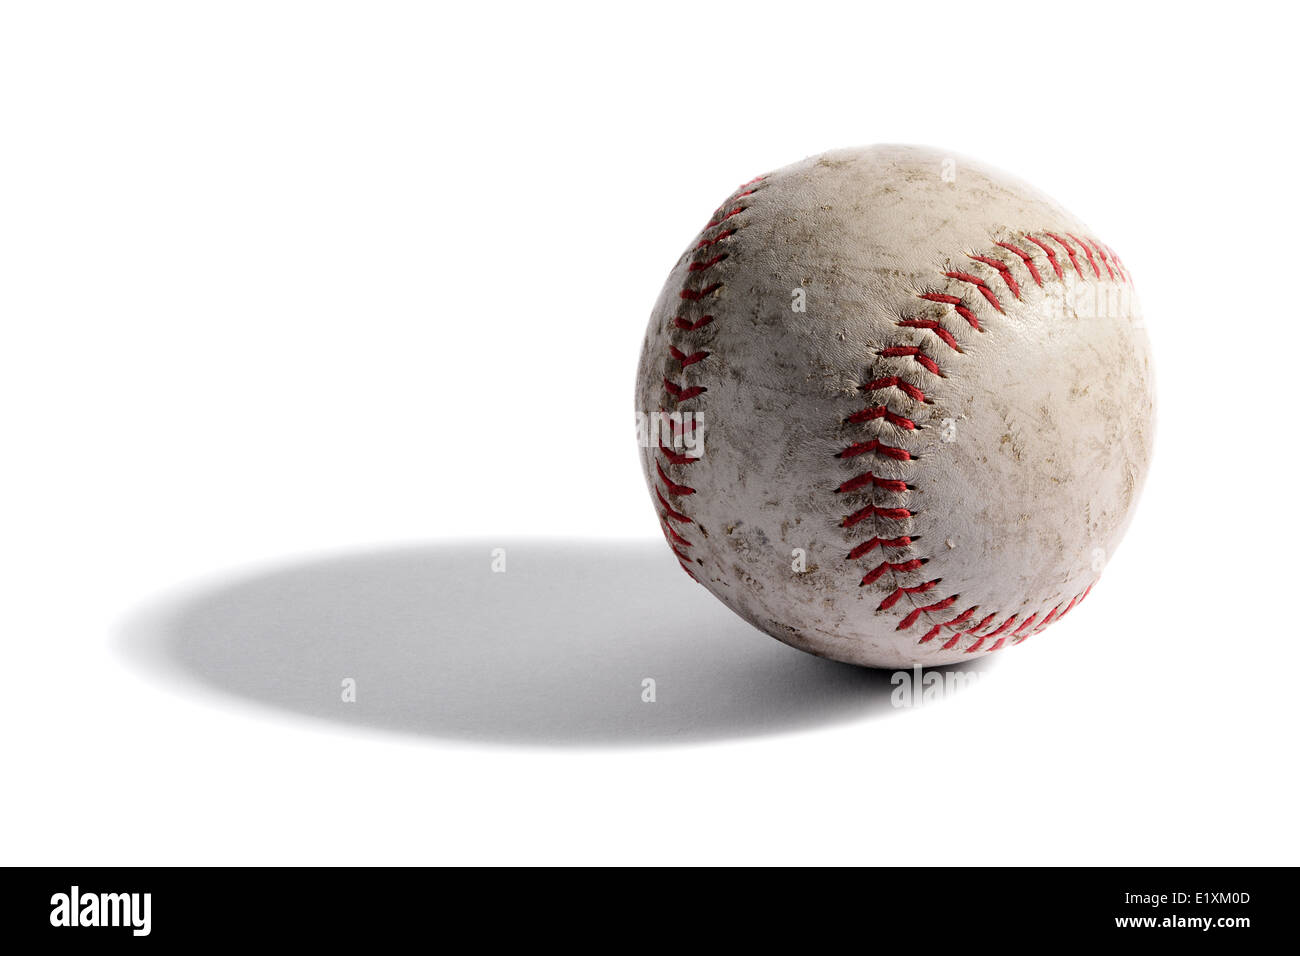 Old leather baseball - Stock Image